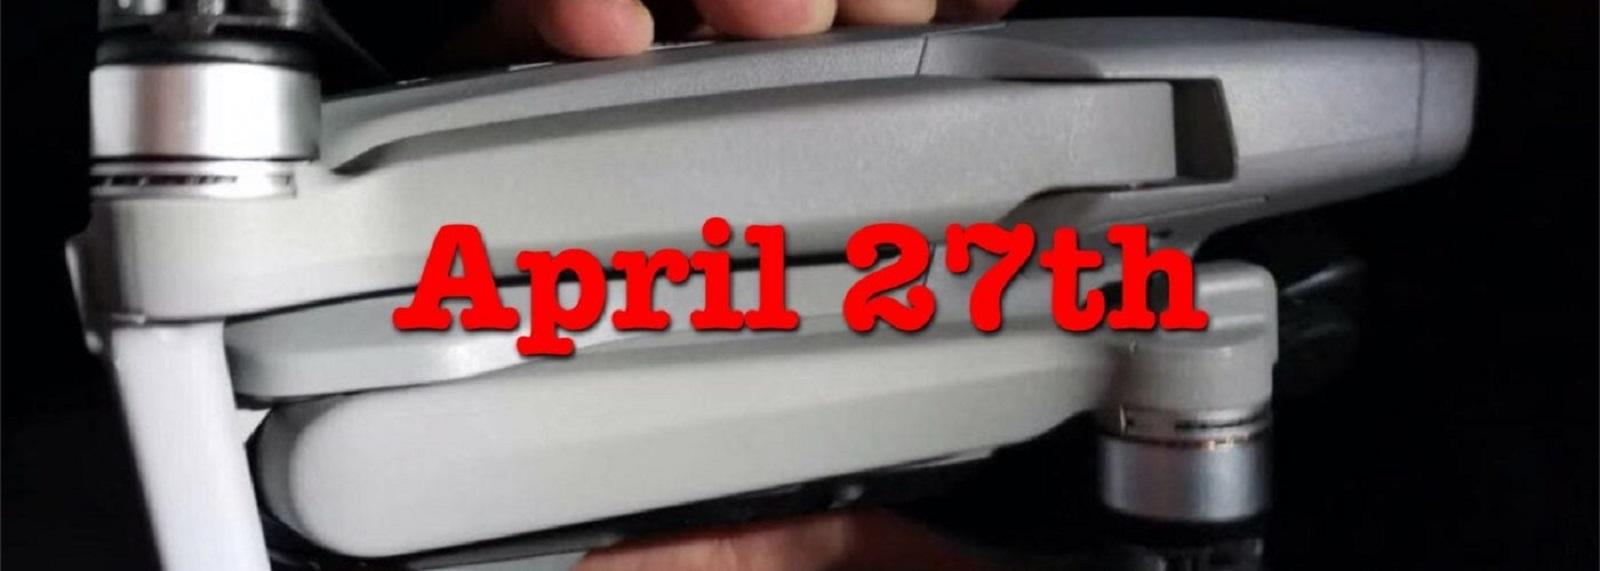 Дата выхода DJI Mavic Air 2